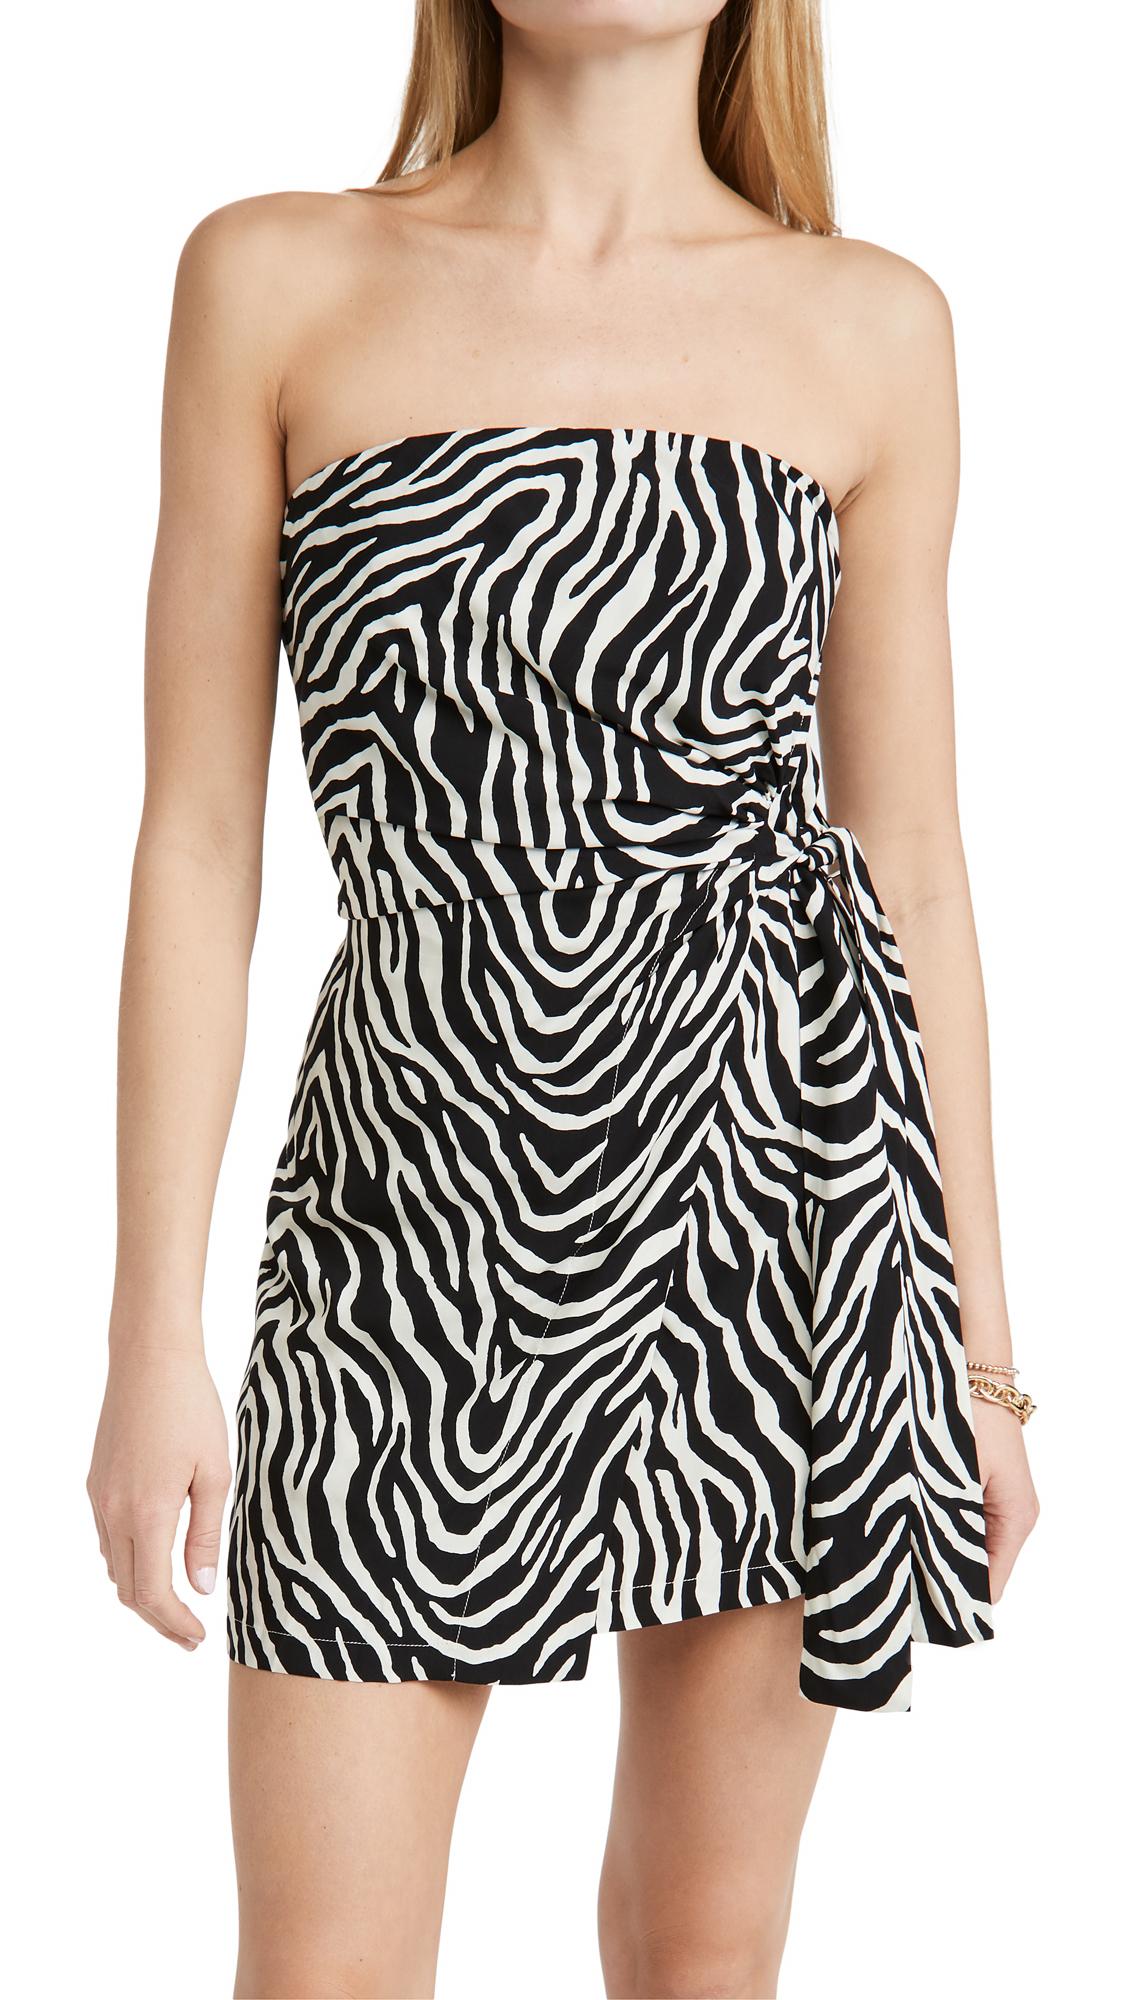 ViX Swimwear Fiorella Black Carolina Short Dress